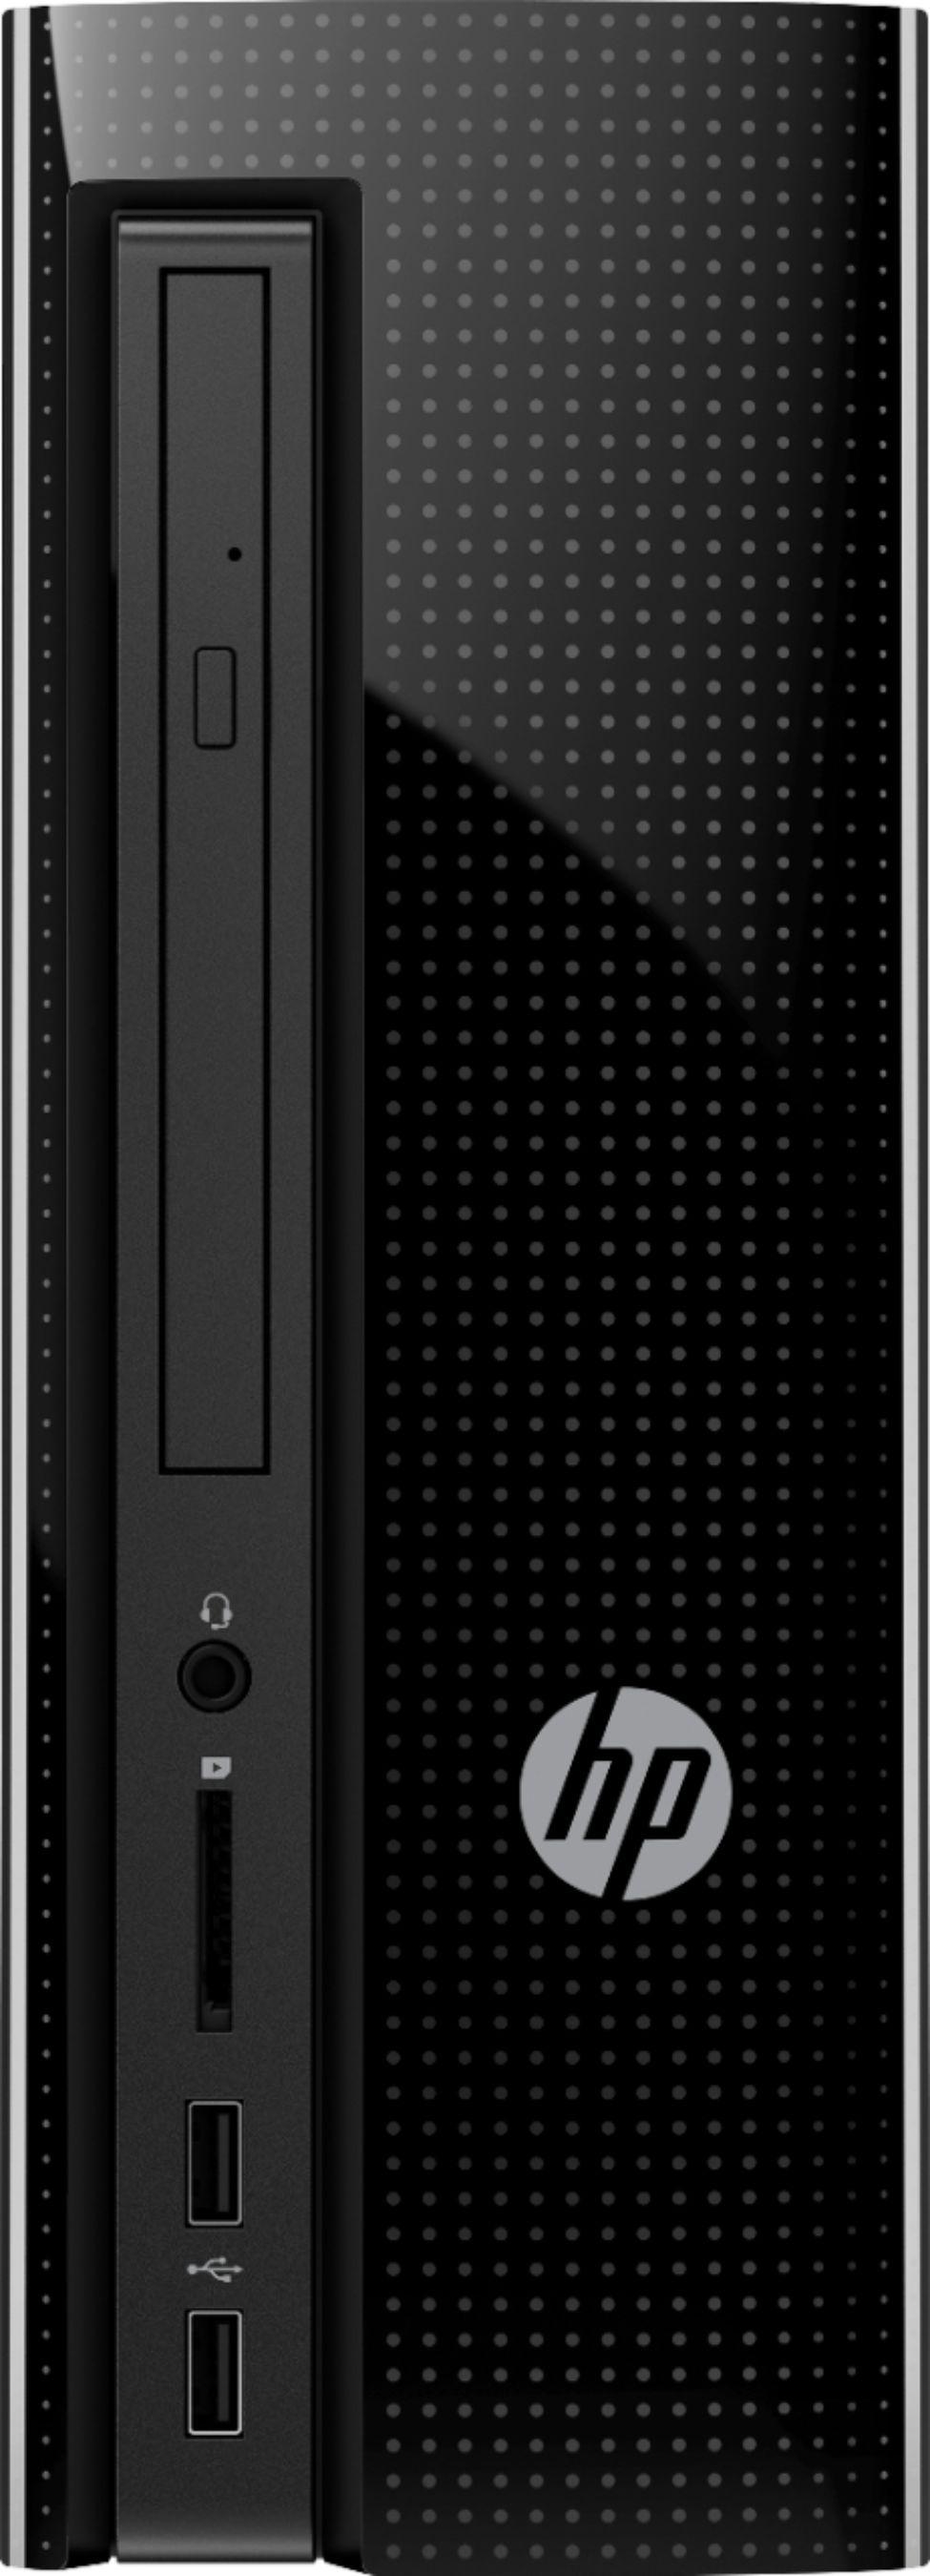 HP i7-8700 desktop $499 at at Best Buy